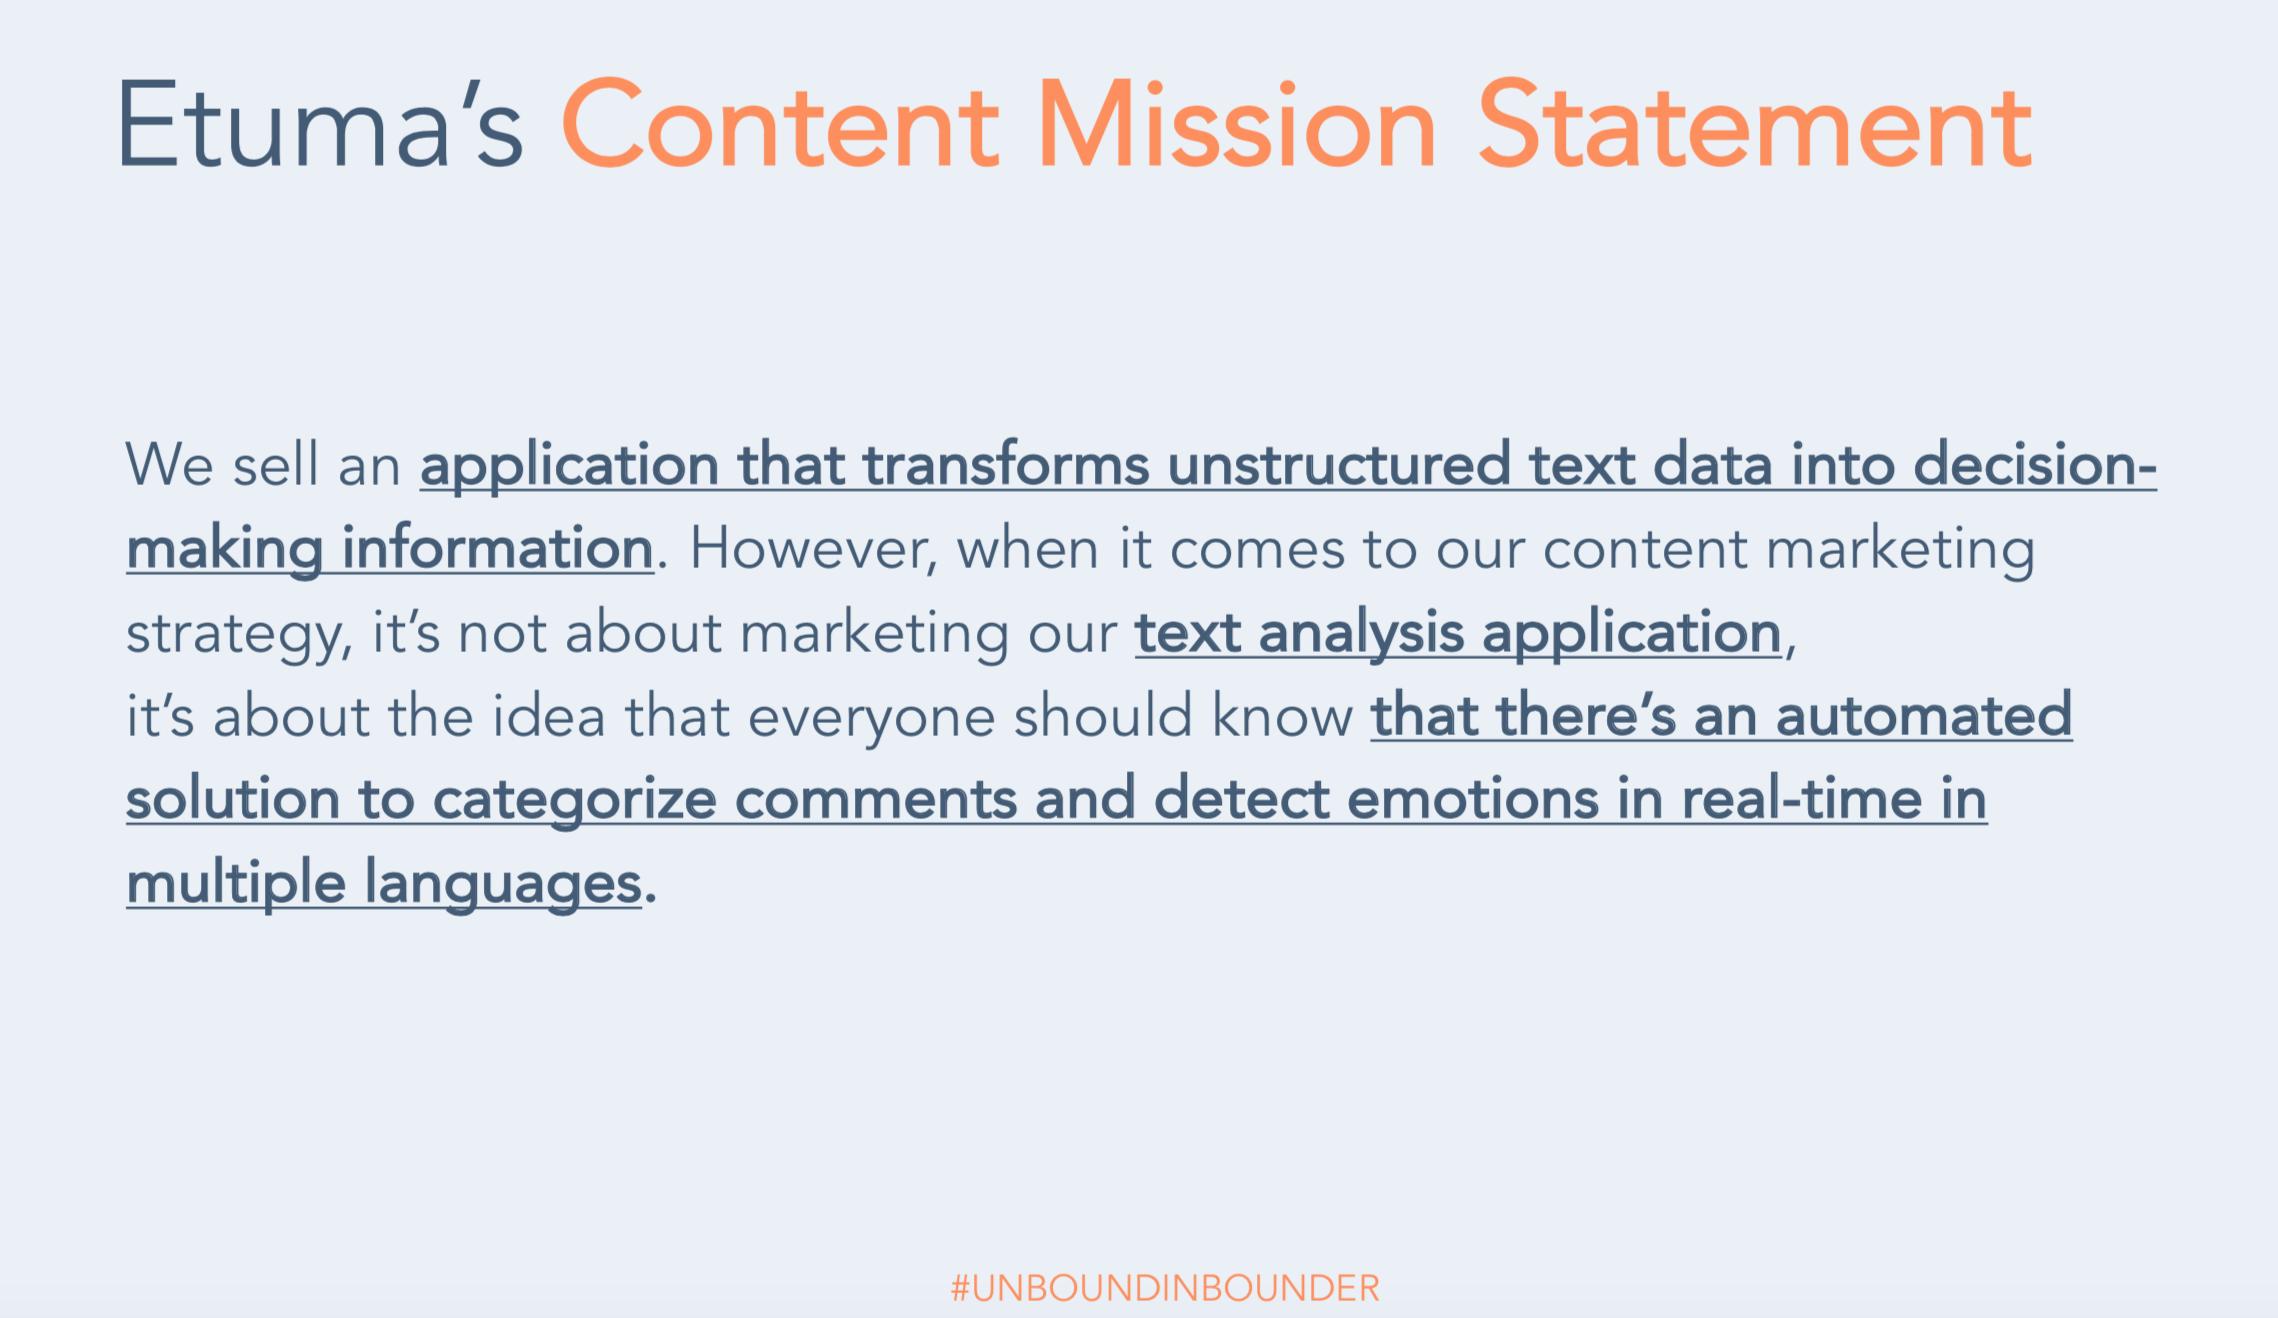 Etuma Content Mission Statement